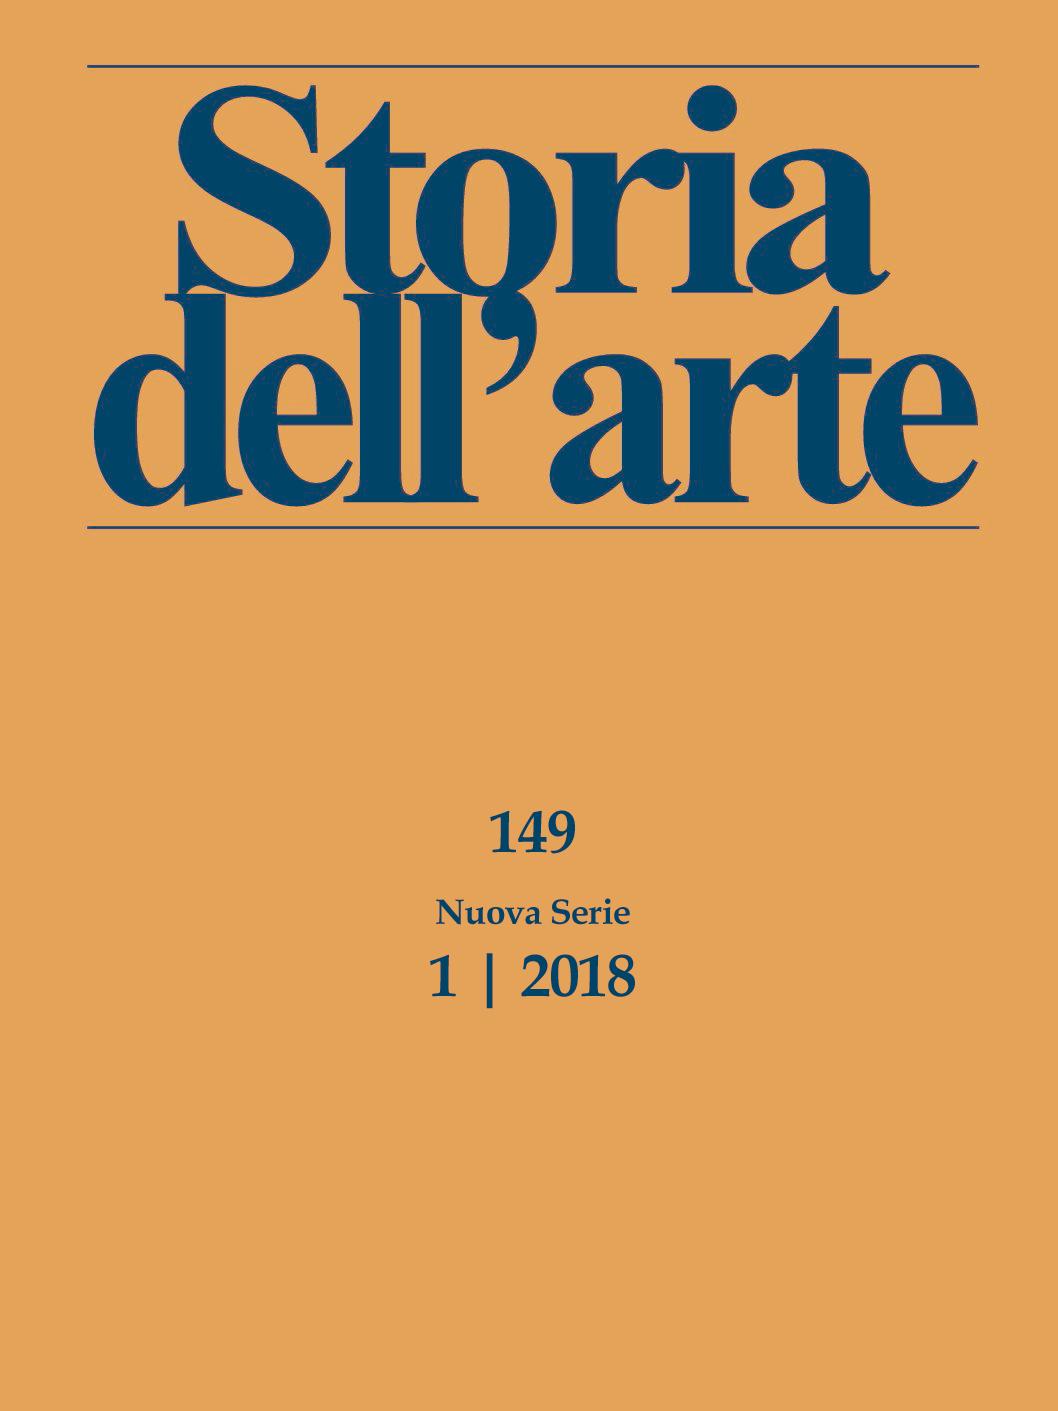 [149] Nuova Serie 1 | 2018